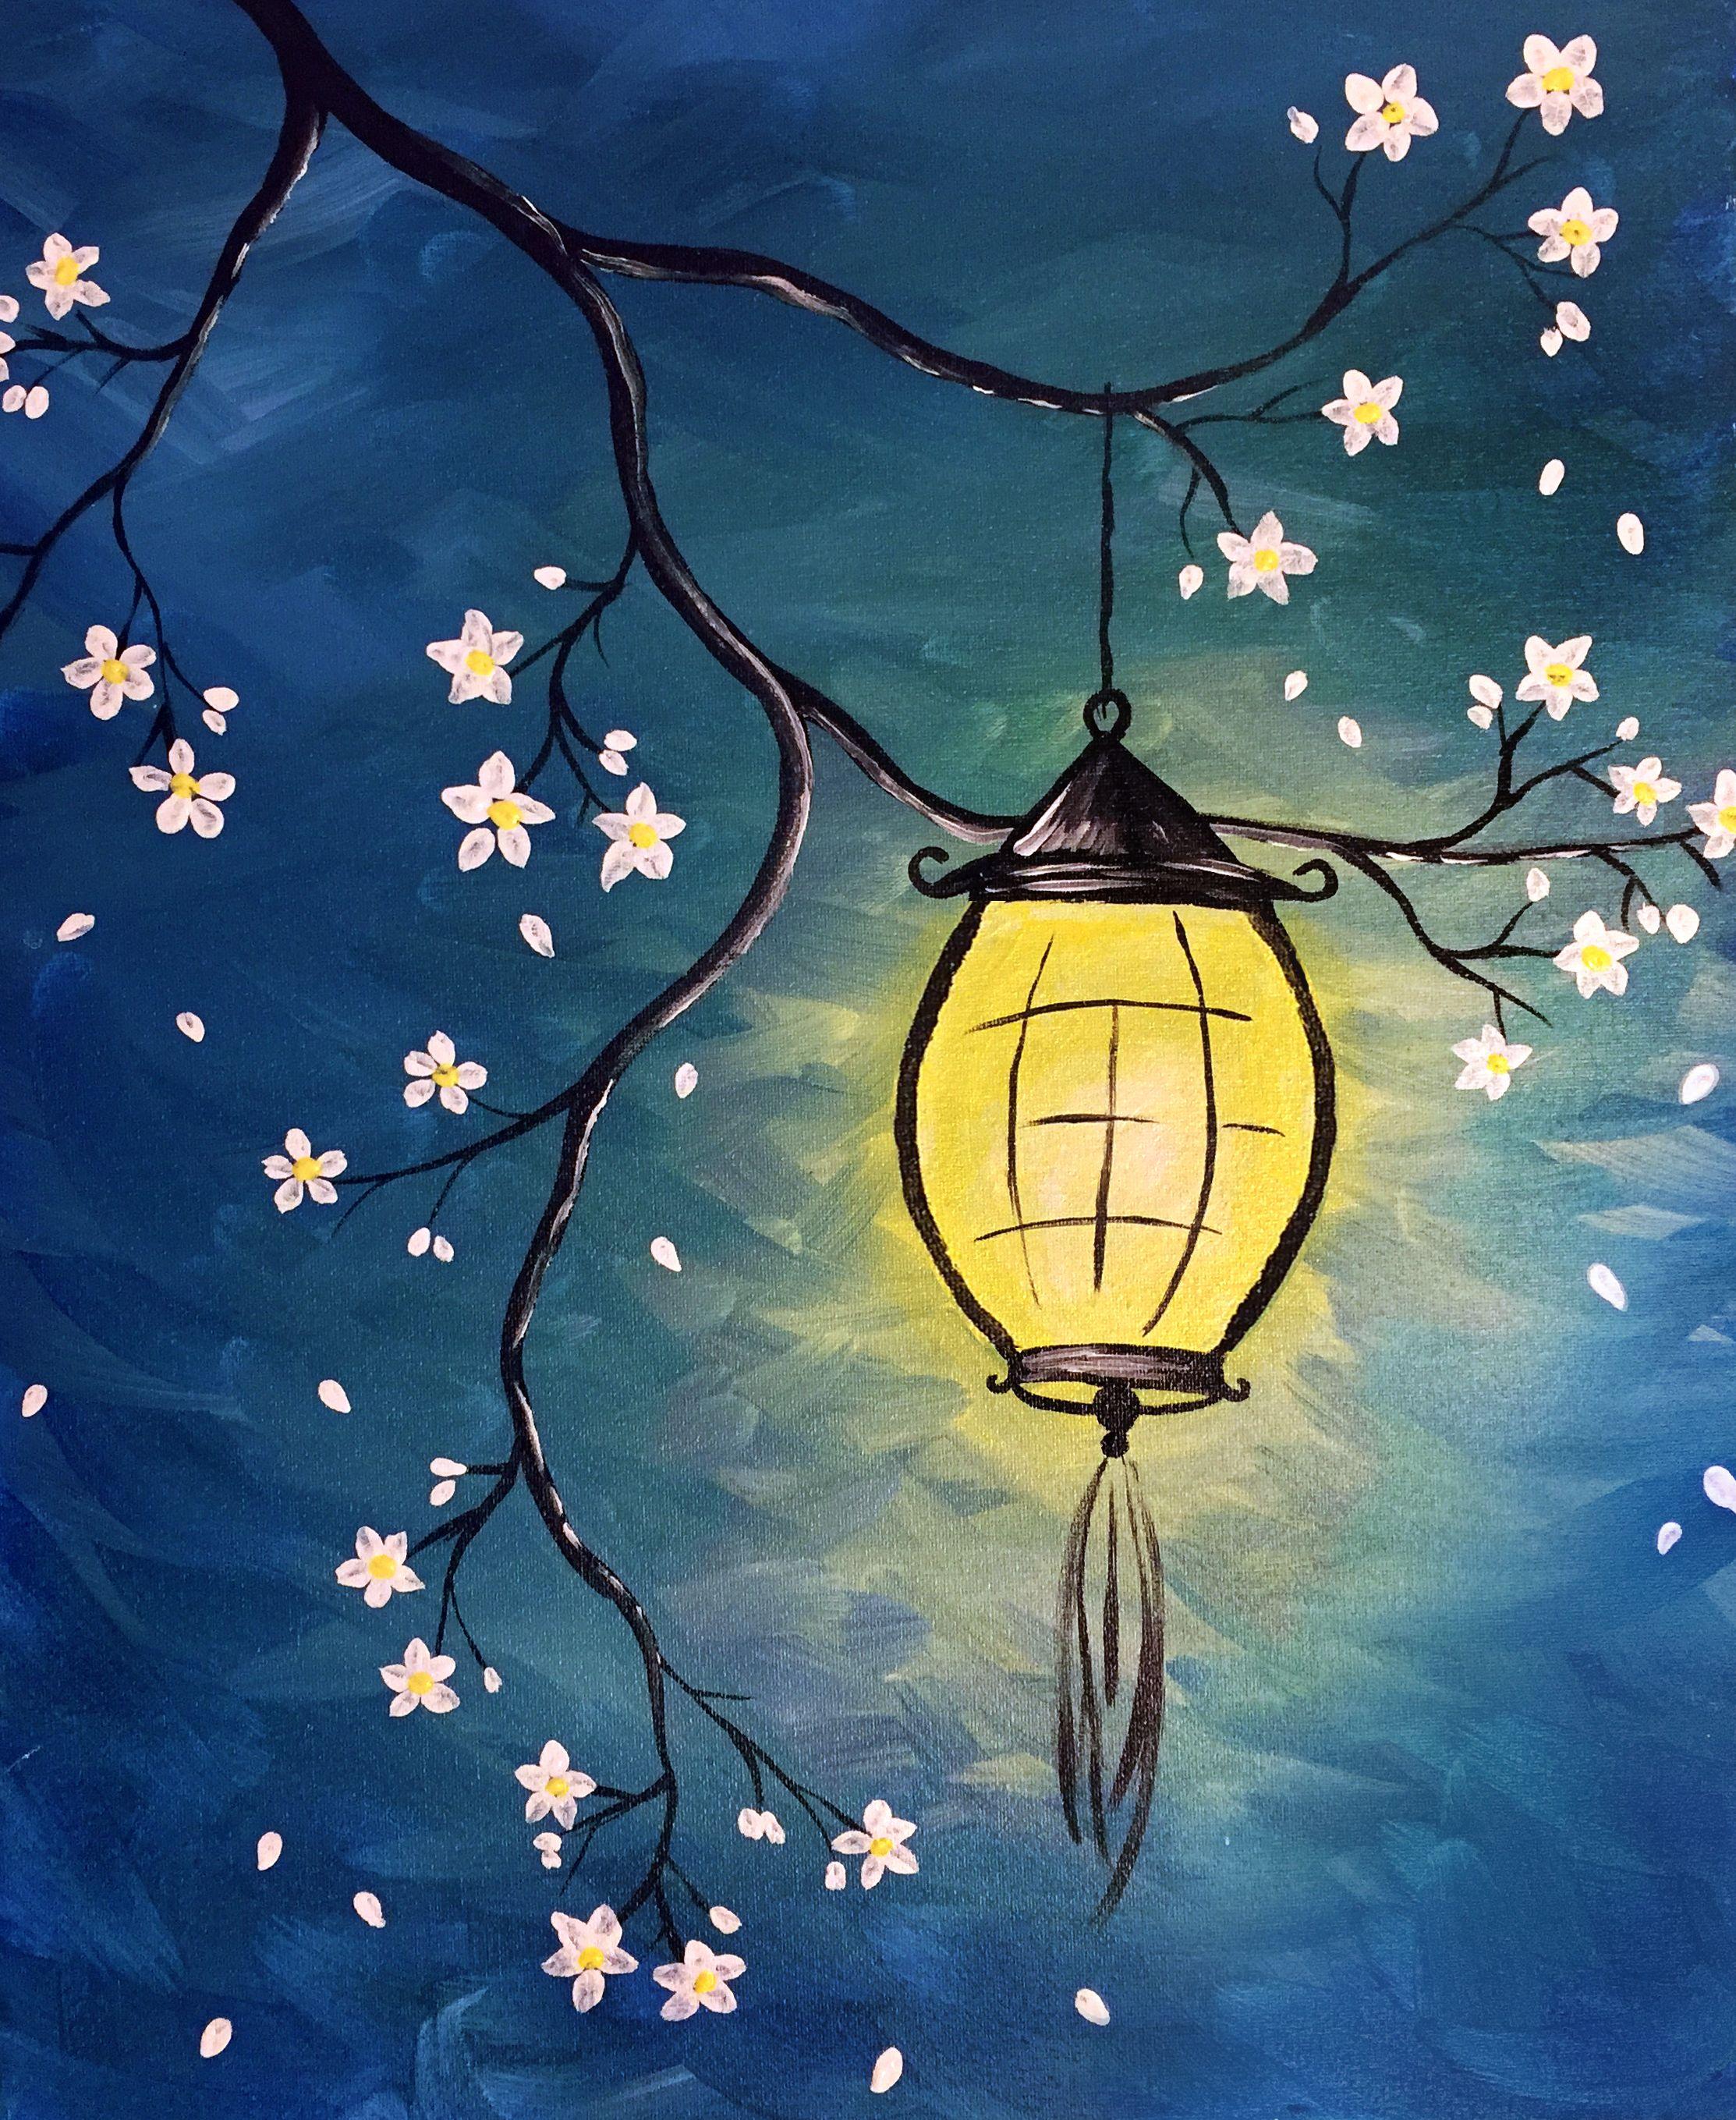 Beginner Acrylic Painting Ideas Tree